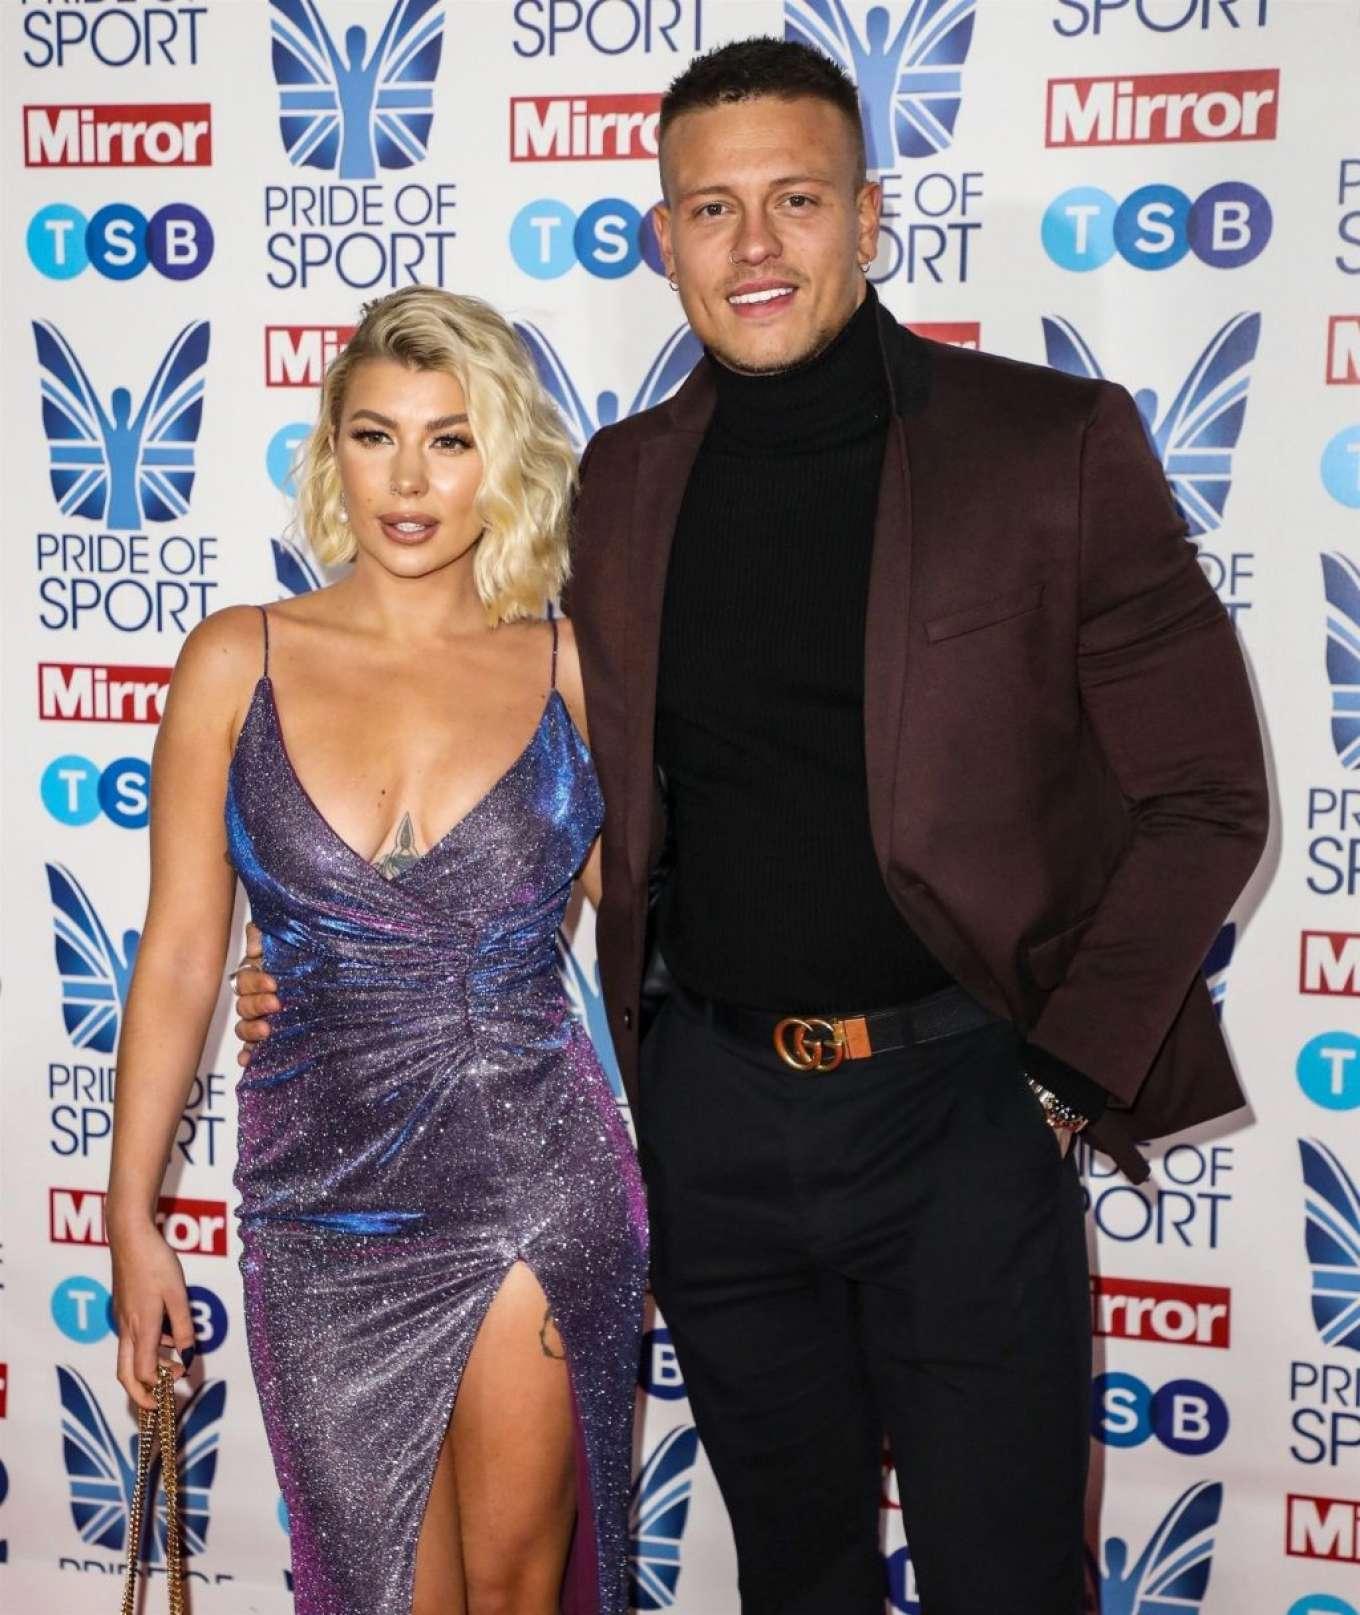 Olivia Buckland 2019 : Olivia Buckland – 2019 Daily Mirror Pride of Sport Awards-29